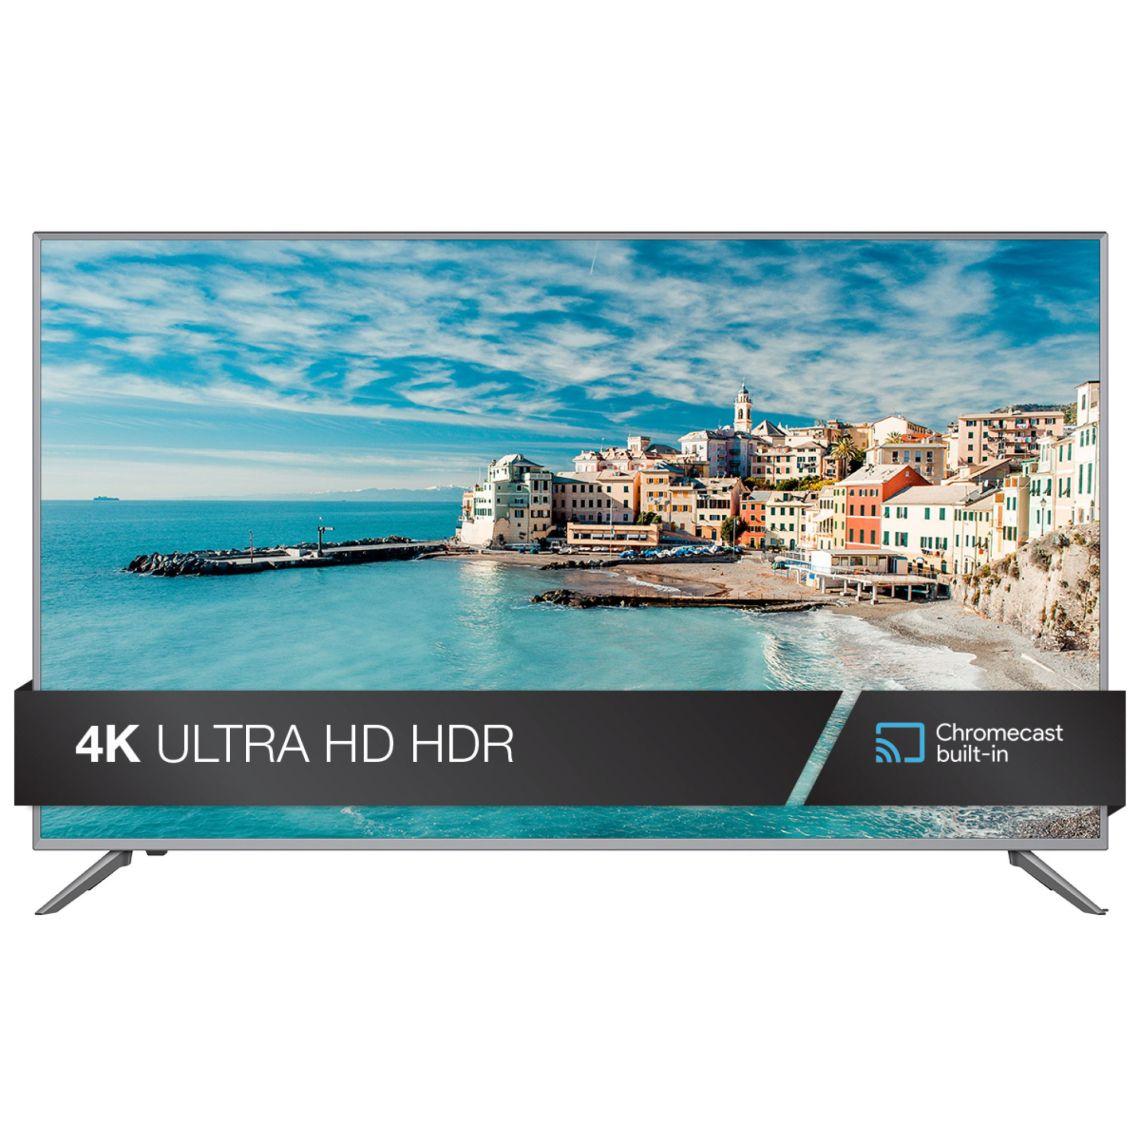 "JVC 55"" Class 4K Ultra HD (2160P) HDR Smart LED TV with Built-in Chromecast (LT-55MA875) - Walmart.com"